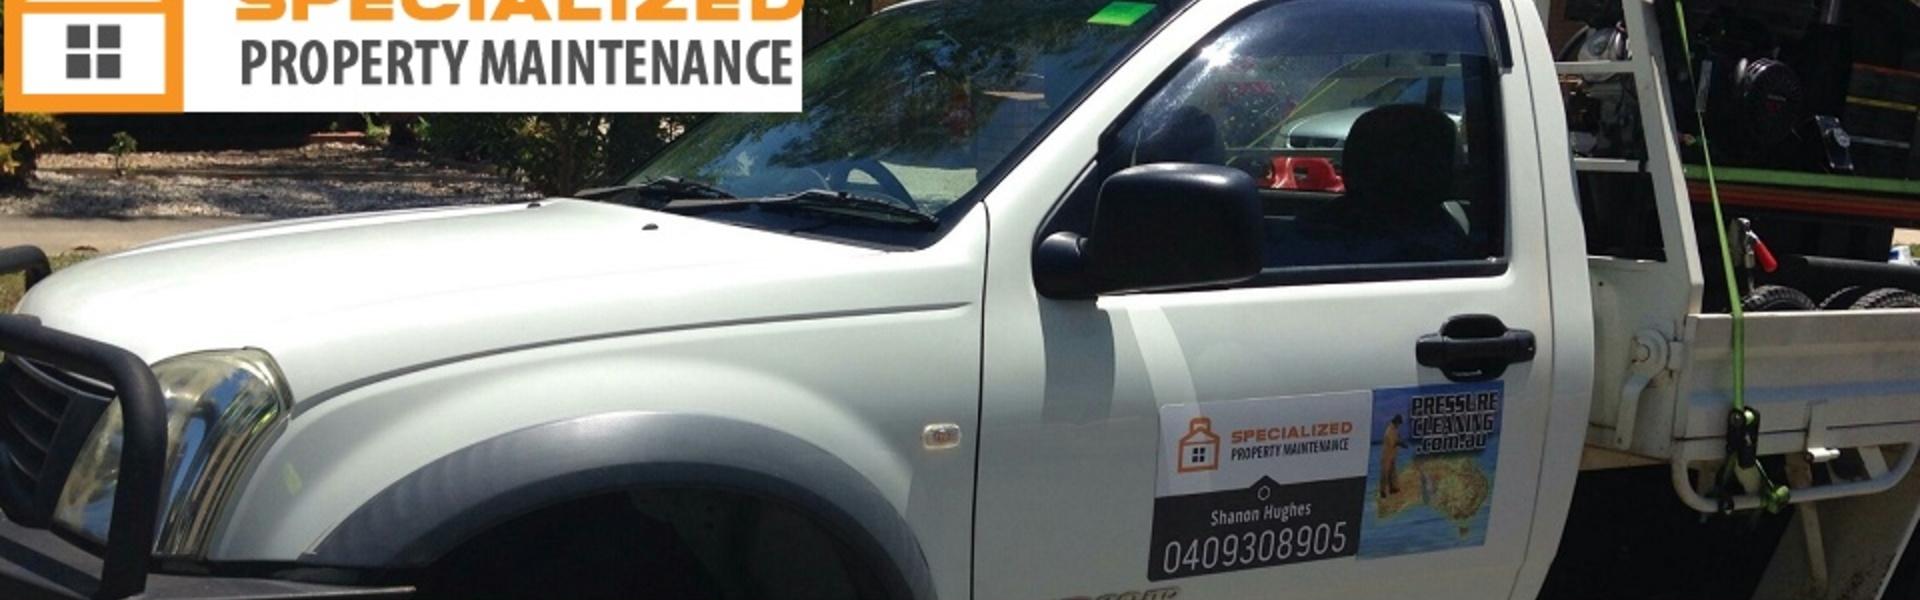 Specialized Property Maintenance Vehicle